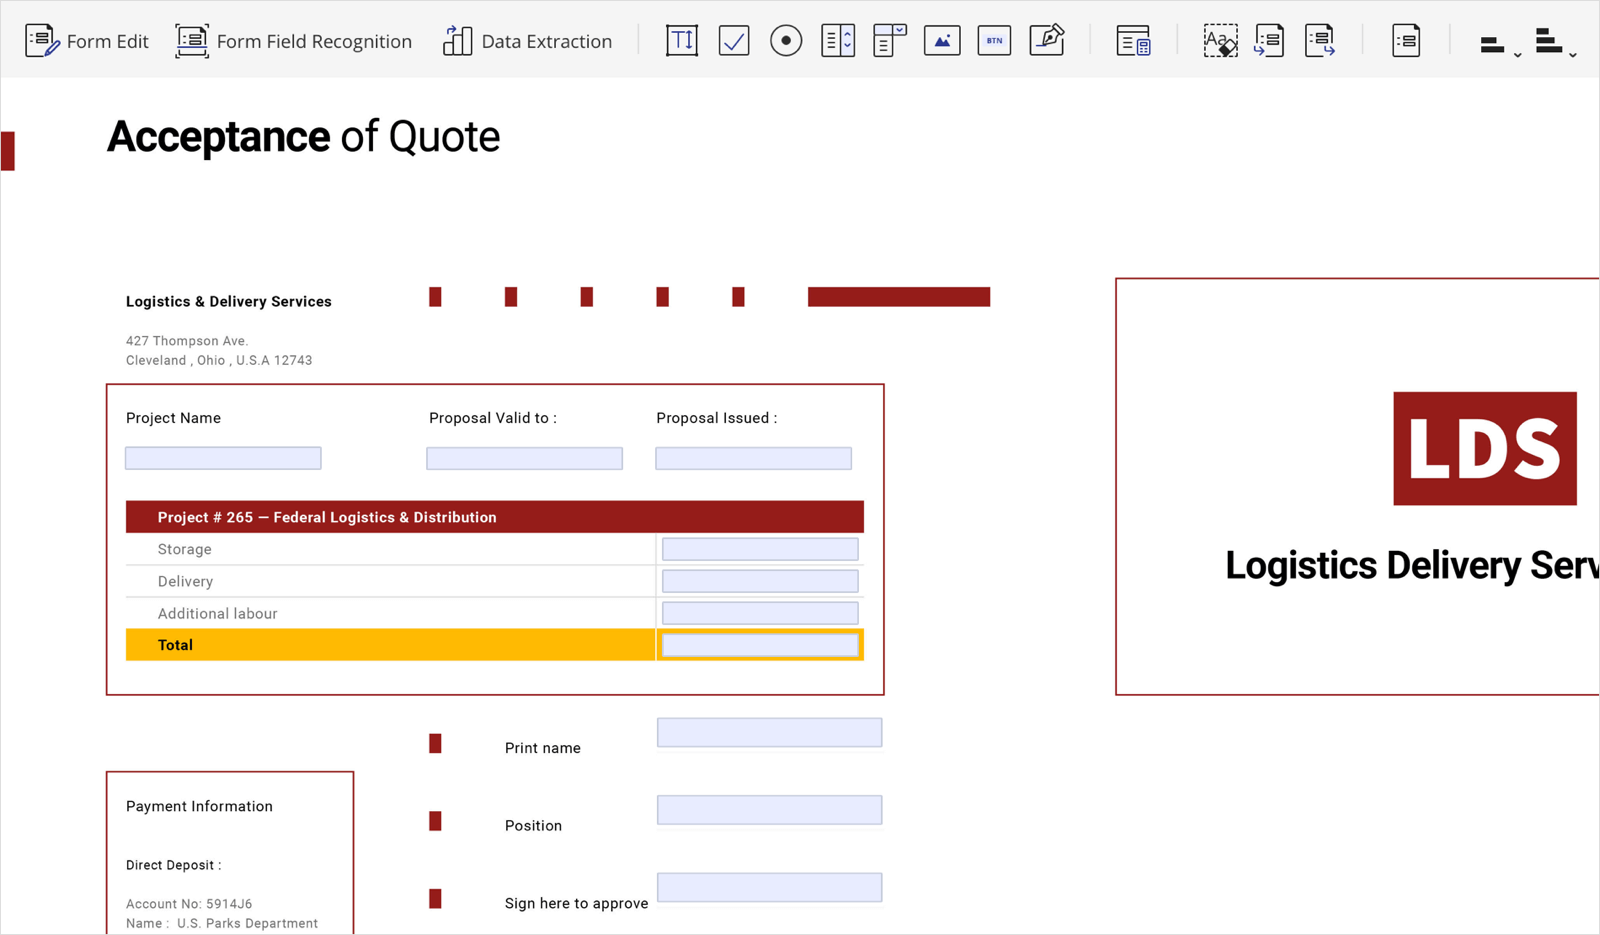 PDFelement Software - PDFelement form editing